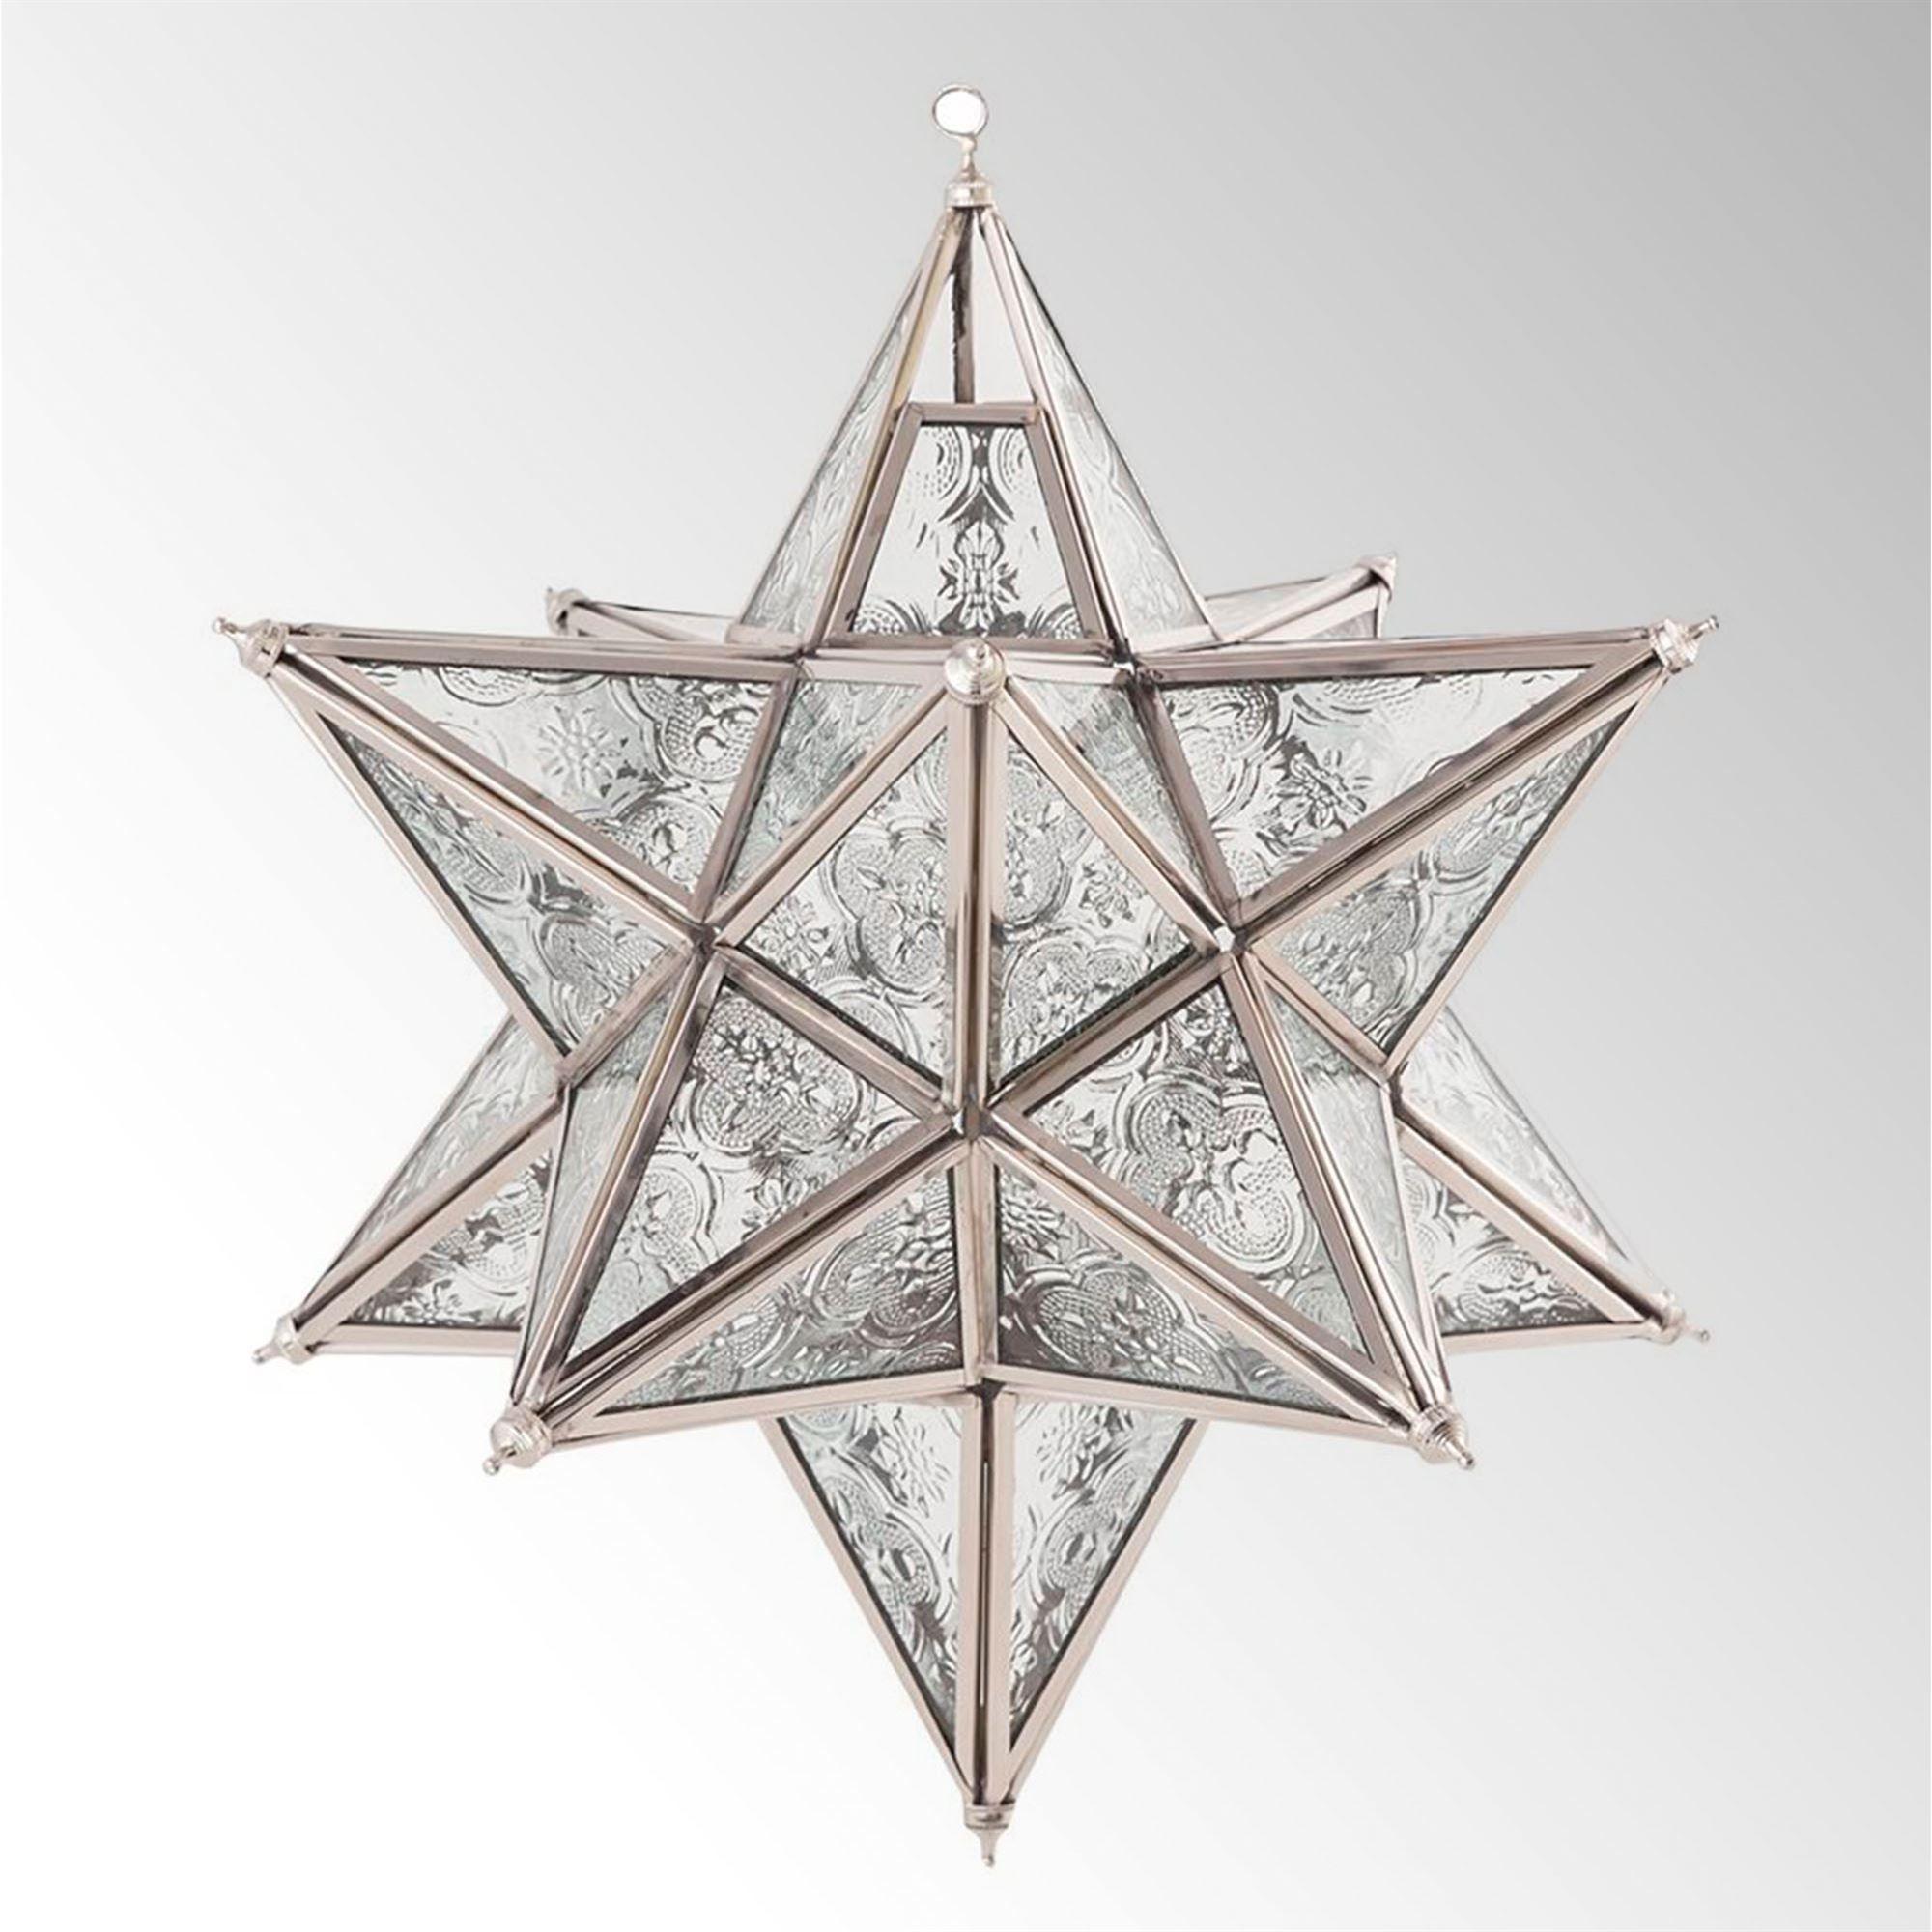 Starlight Moravian Star Hanging Tealight Candleholder Lantern Pendant